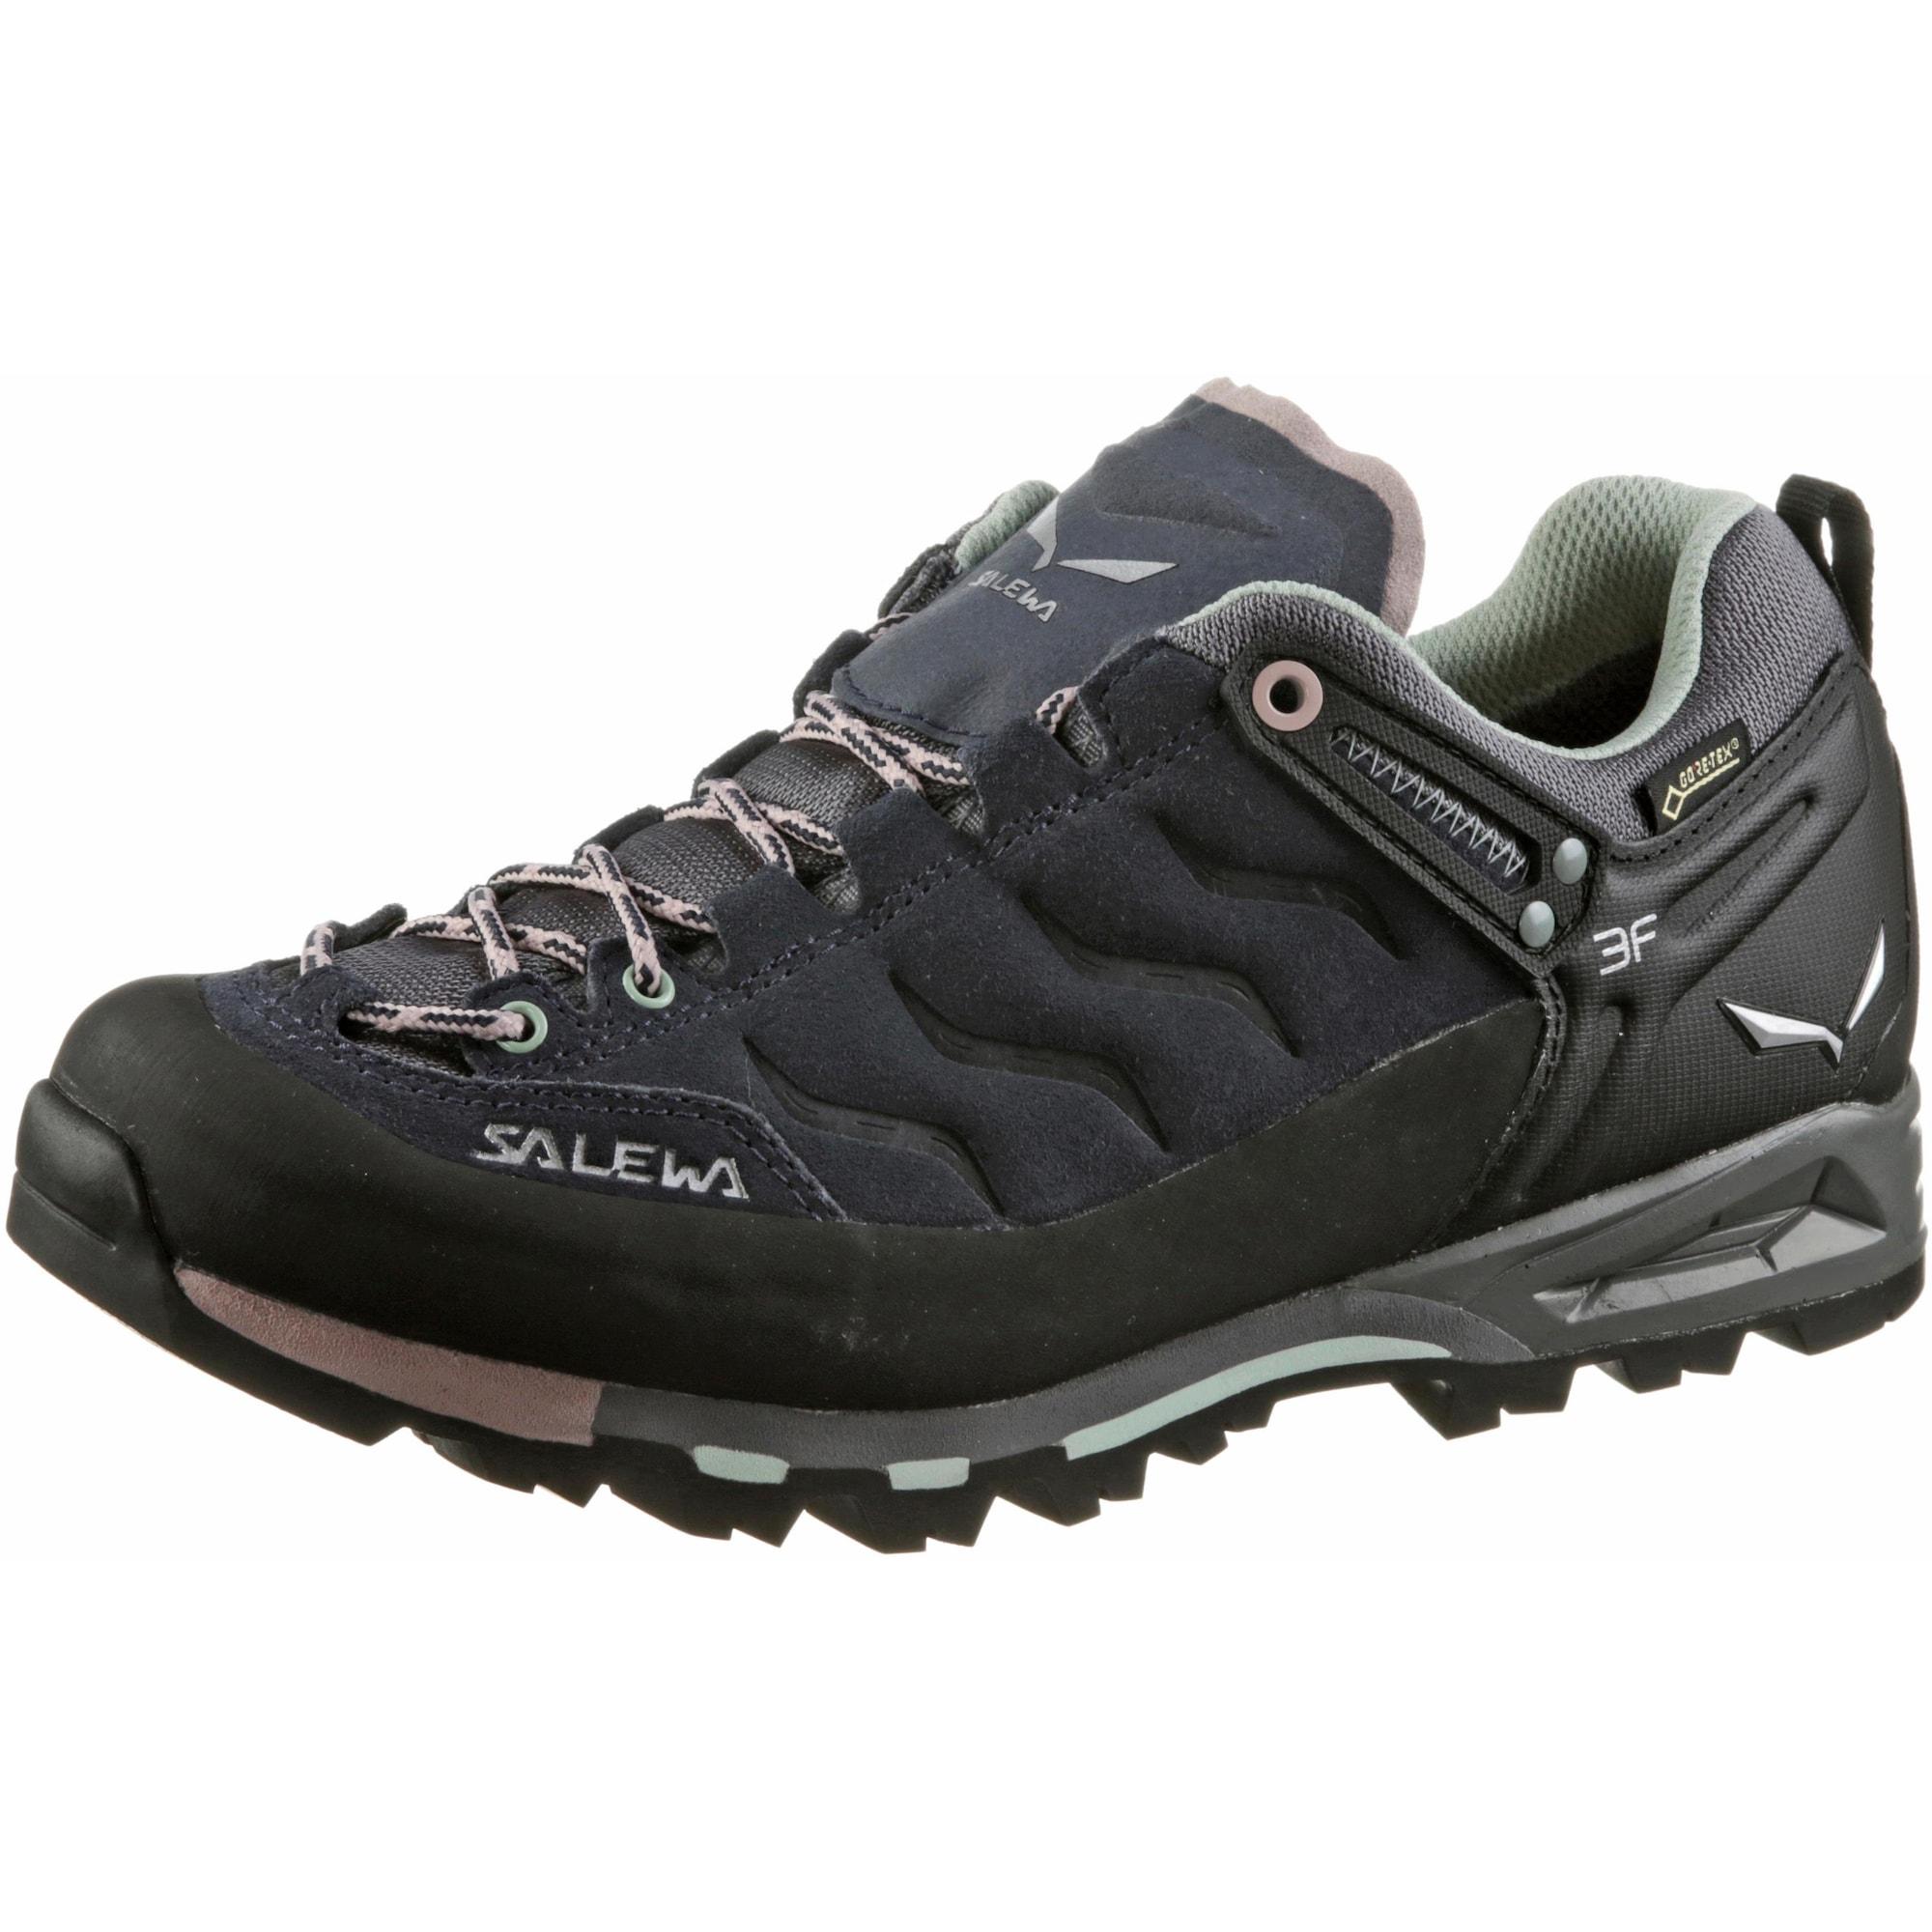 low priced a2153 5d19f AboutYou | Damen SALEWA Schuhe WS MTN Trainer GTX grau ...